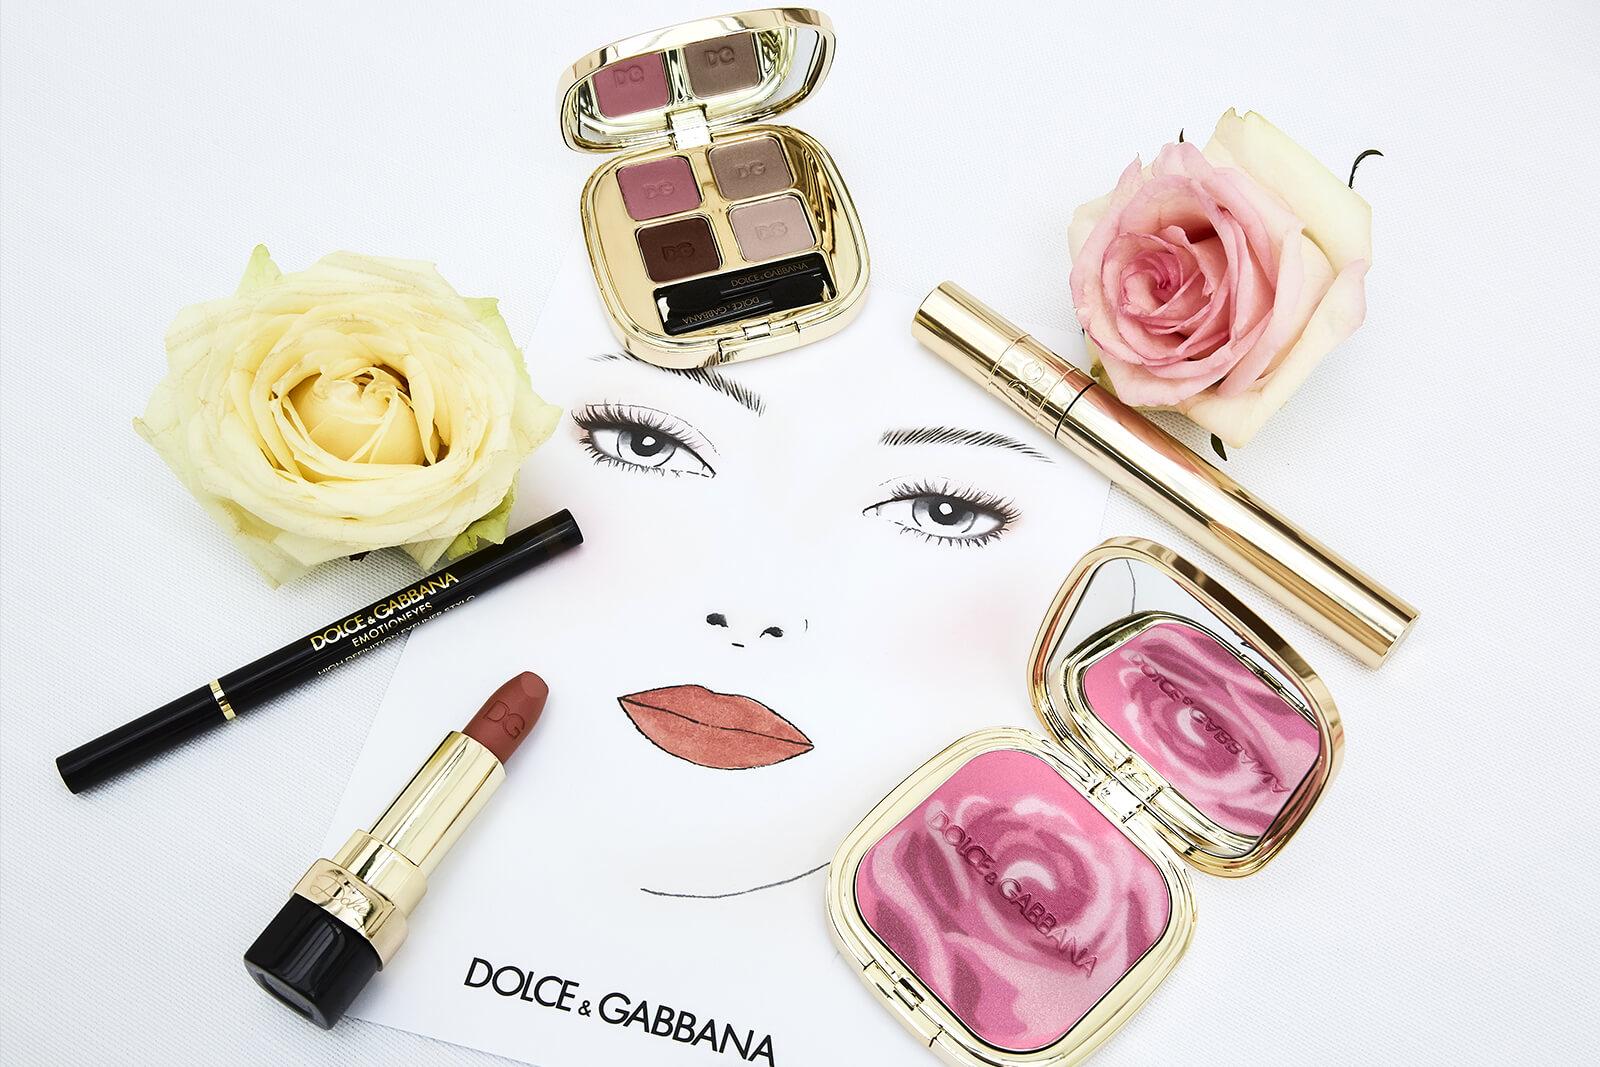 dolce-gabbana-dolce-garden-makeup